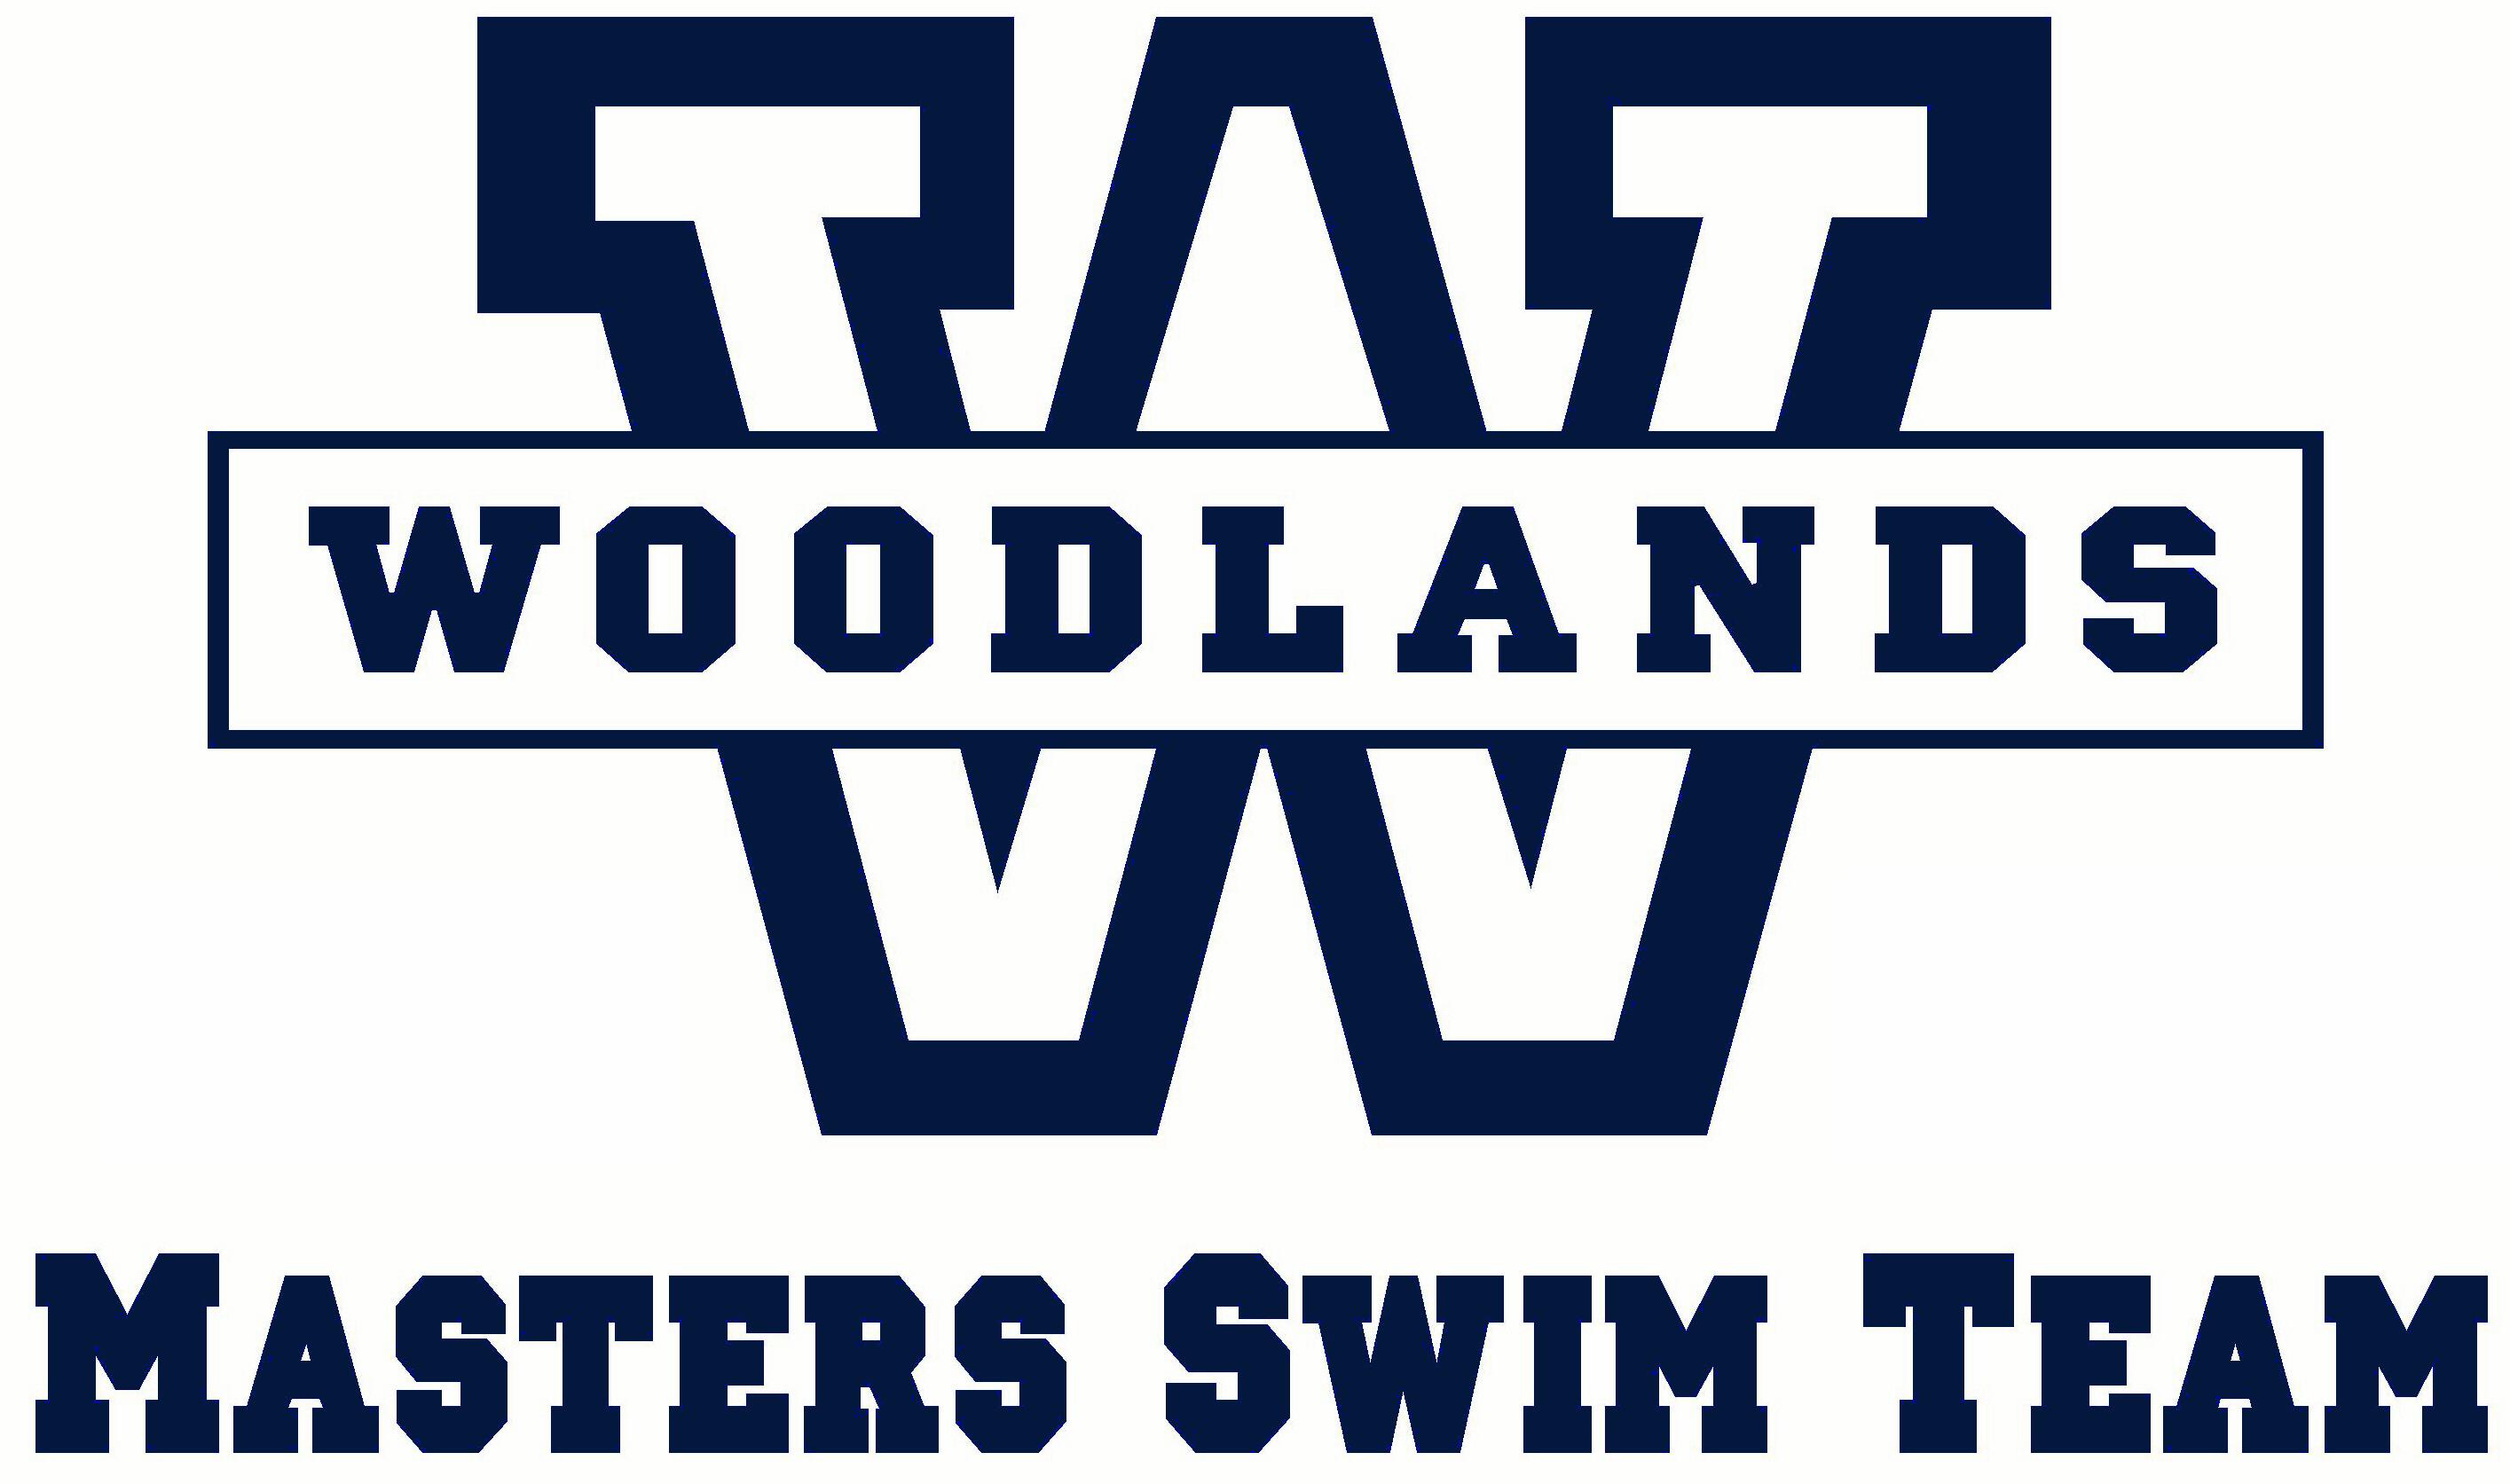 Swim Meet Excel Spreadsheet With Upcoming Swim Meets